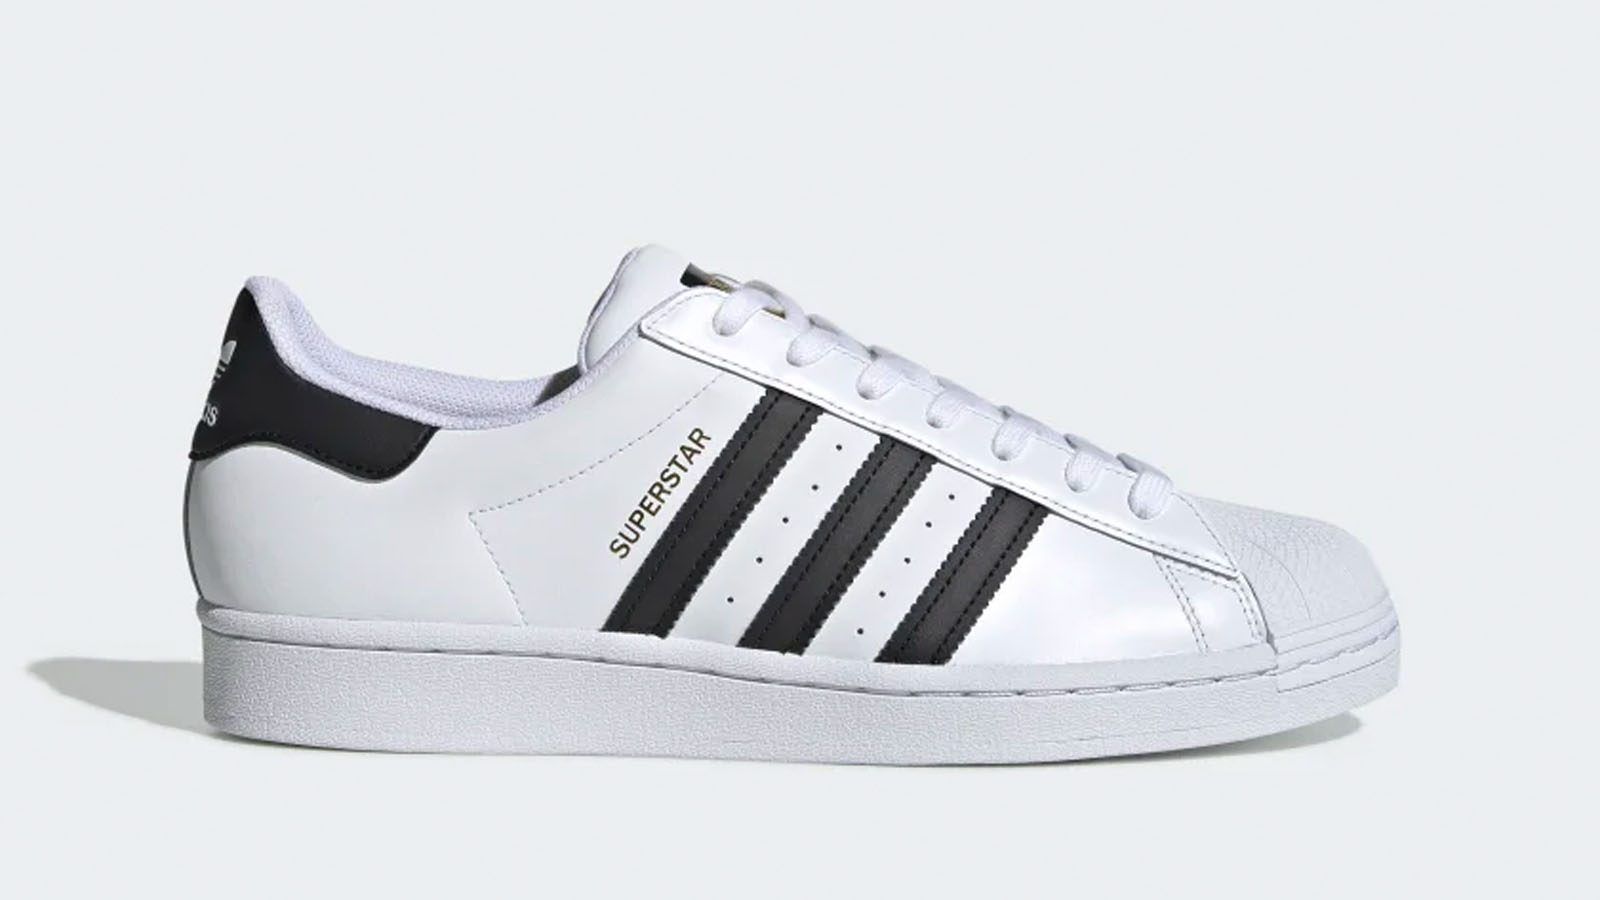 adidas listicle_0014_adidas superstar